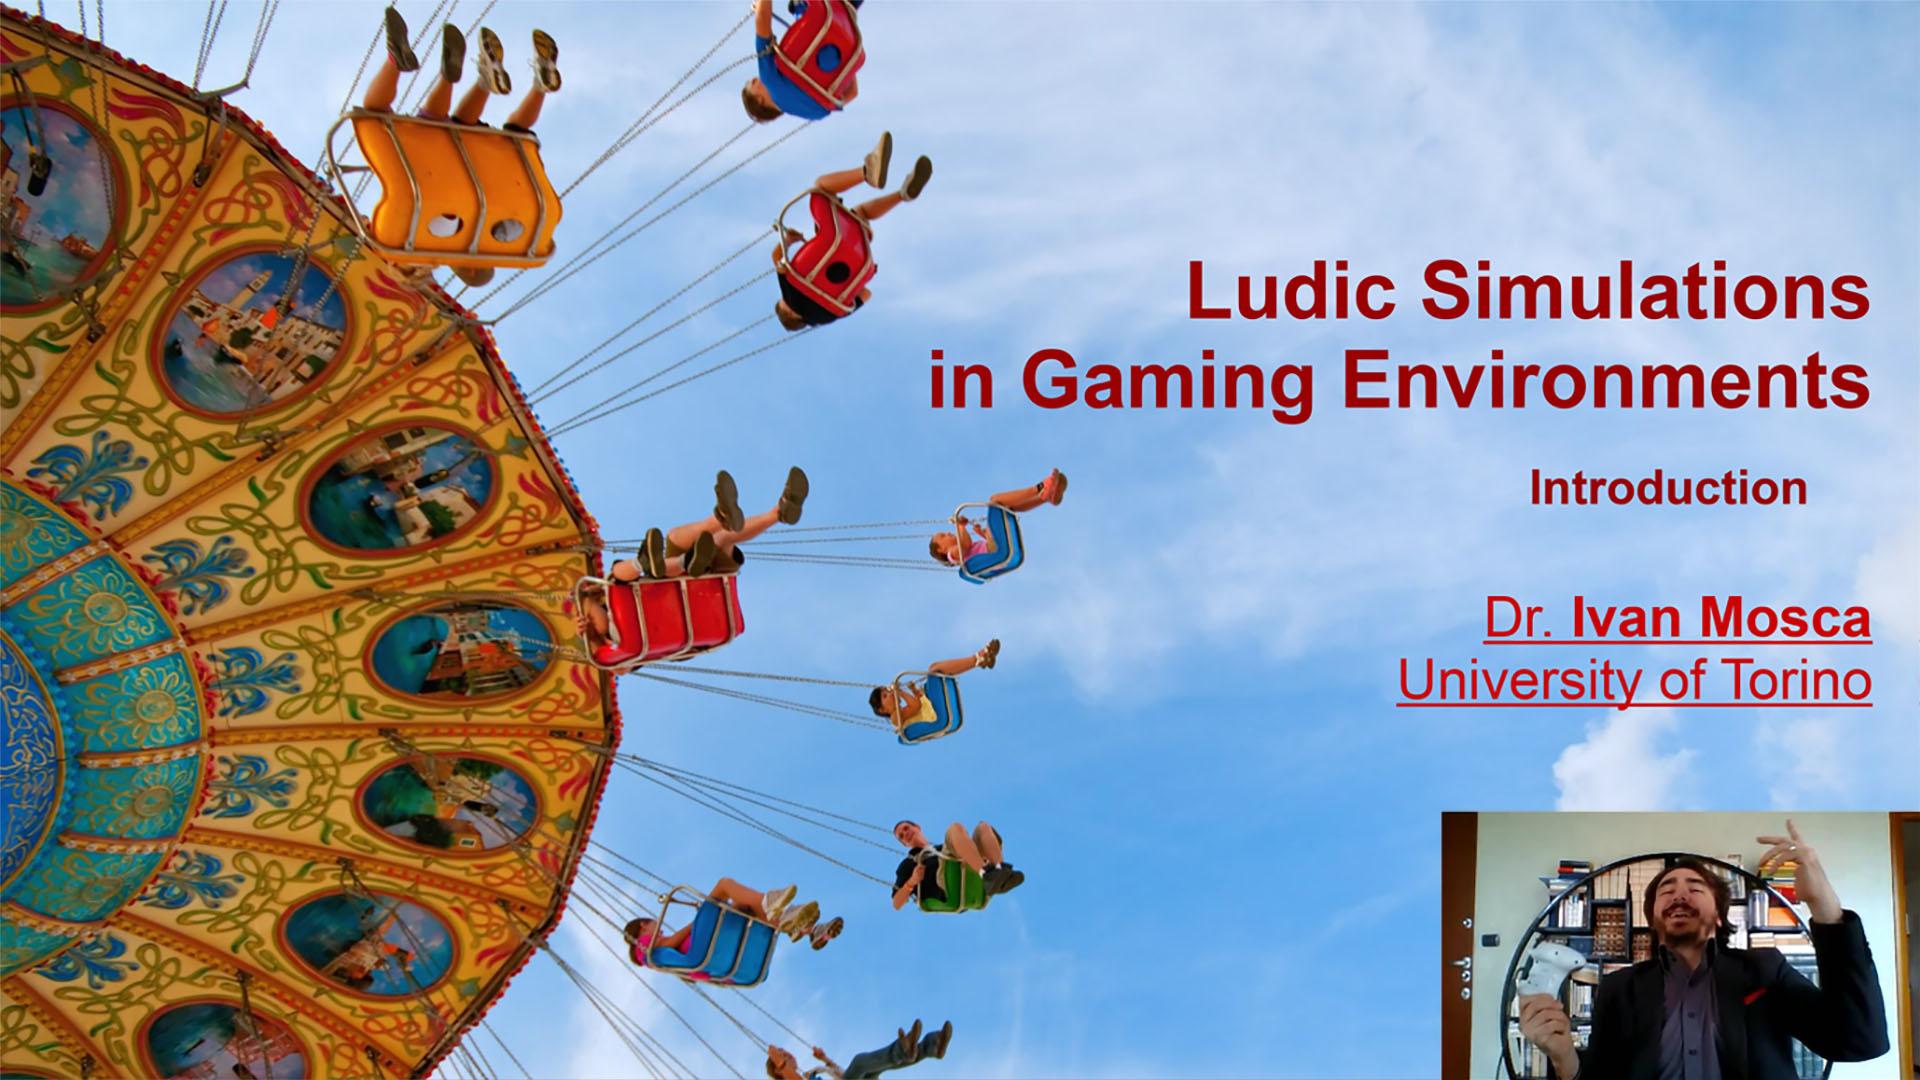 Ludic Simulations in Gaming Environments